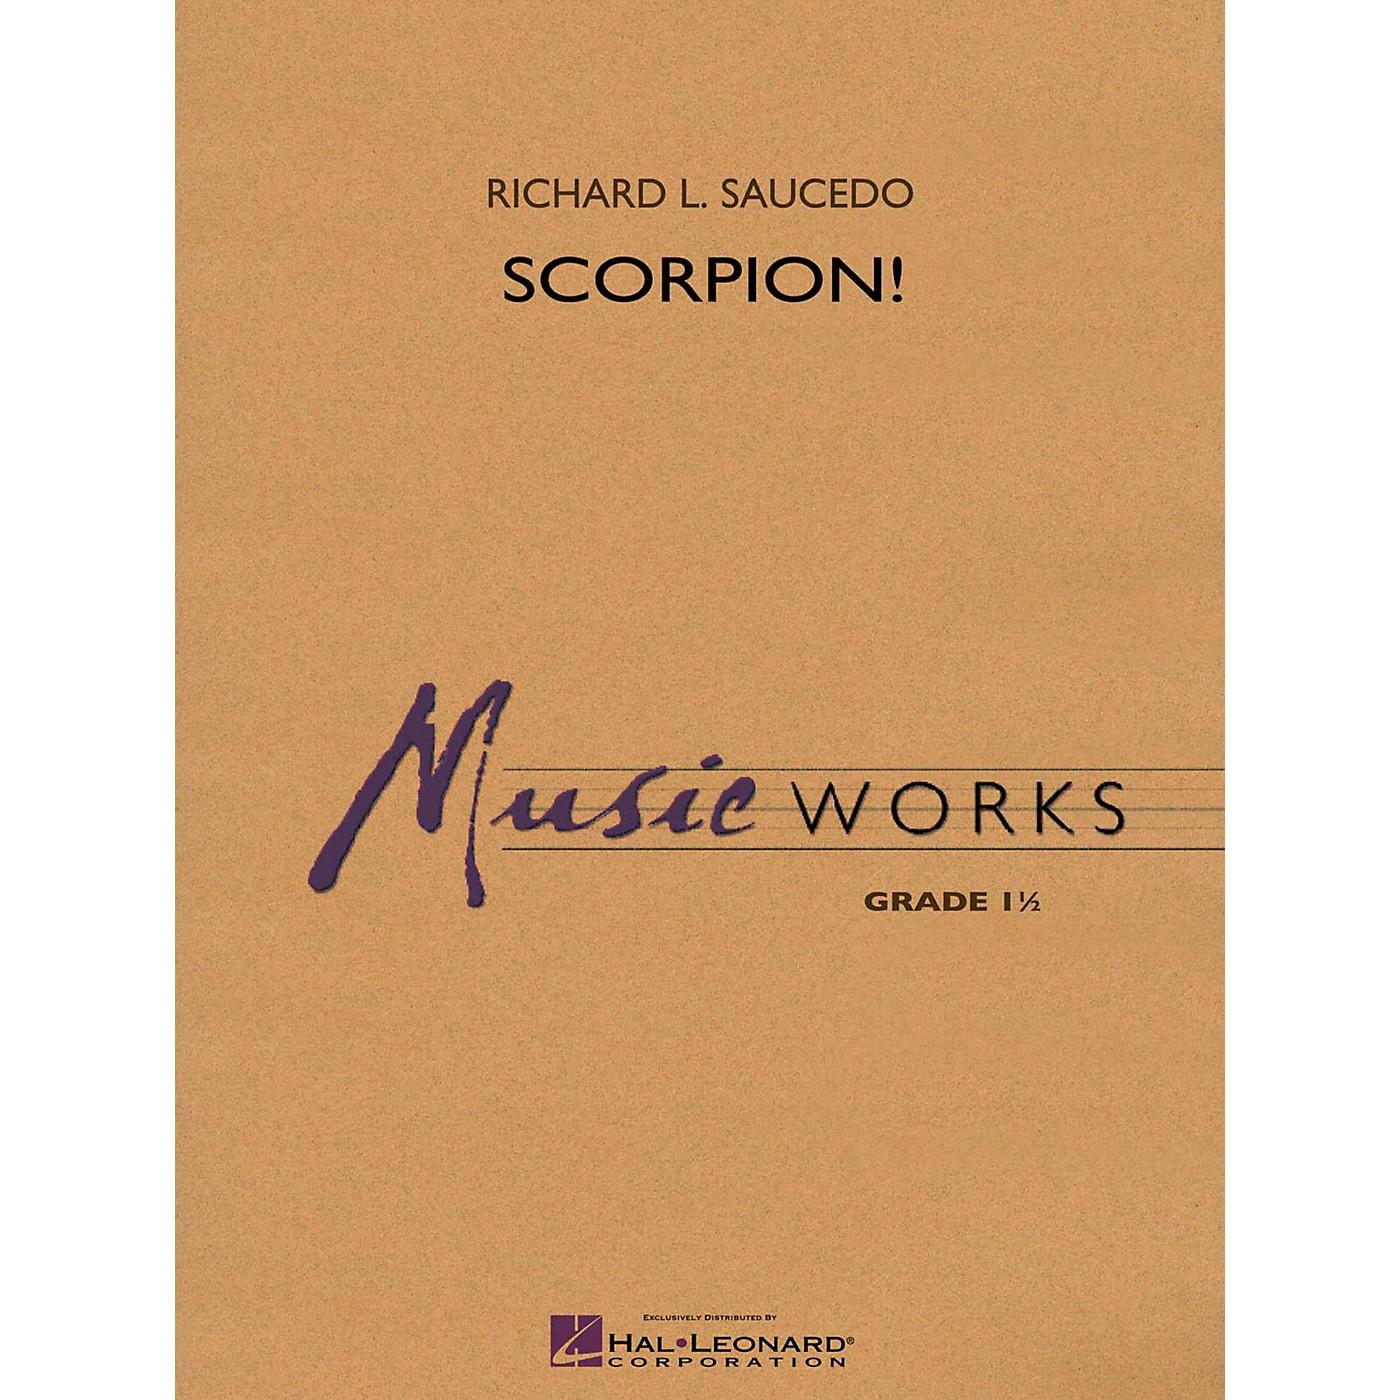 Hal Leonard Scorpion! - MusicWorks Concert Band Grade 1 thumbnail